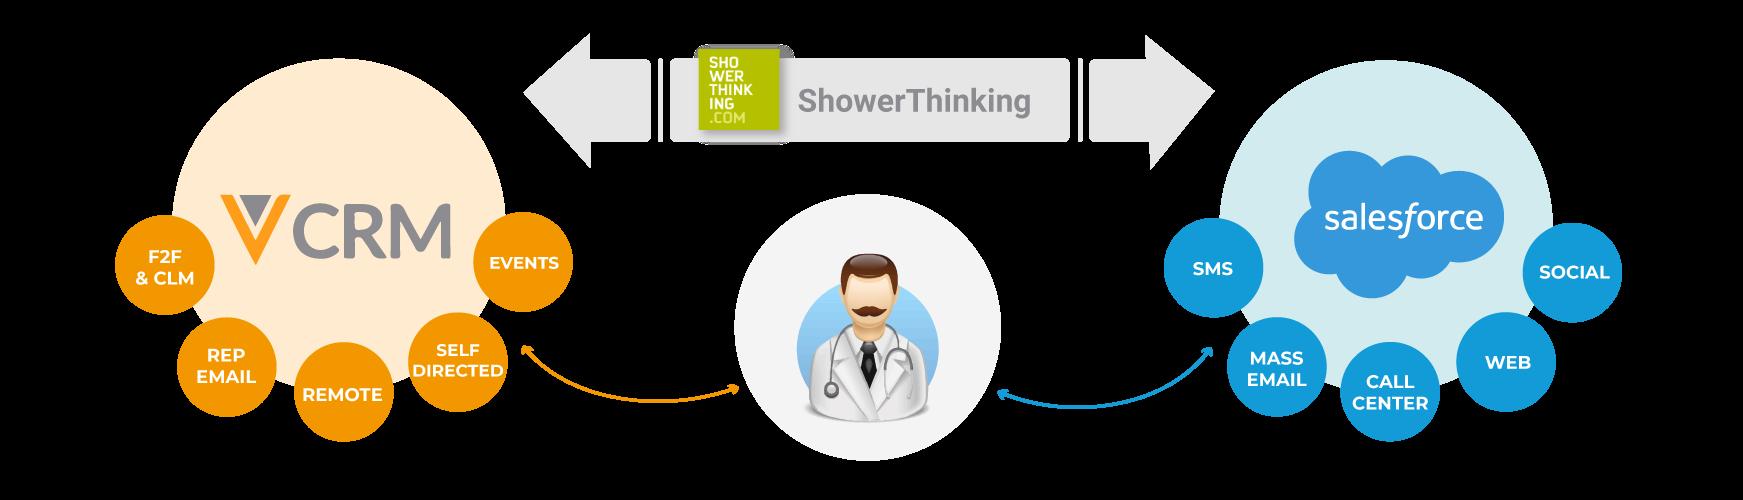 Veeva Salesforce ShowerThinking